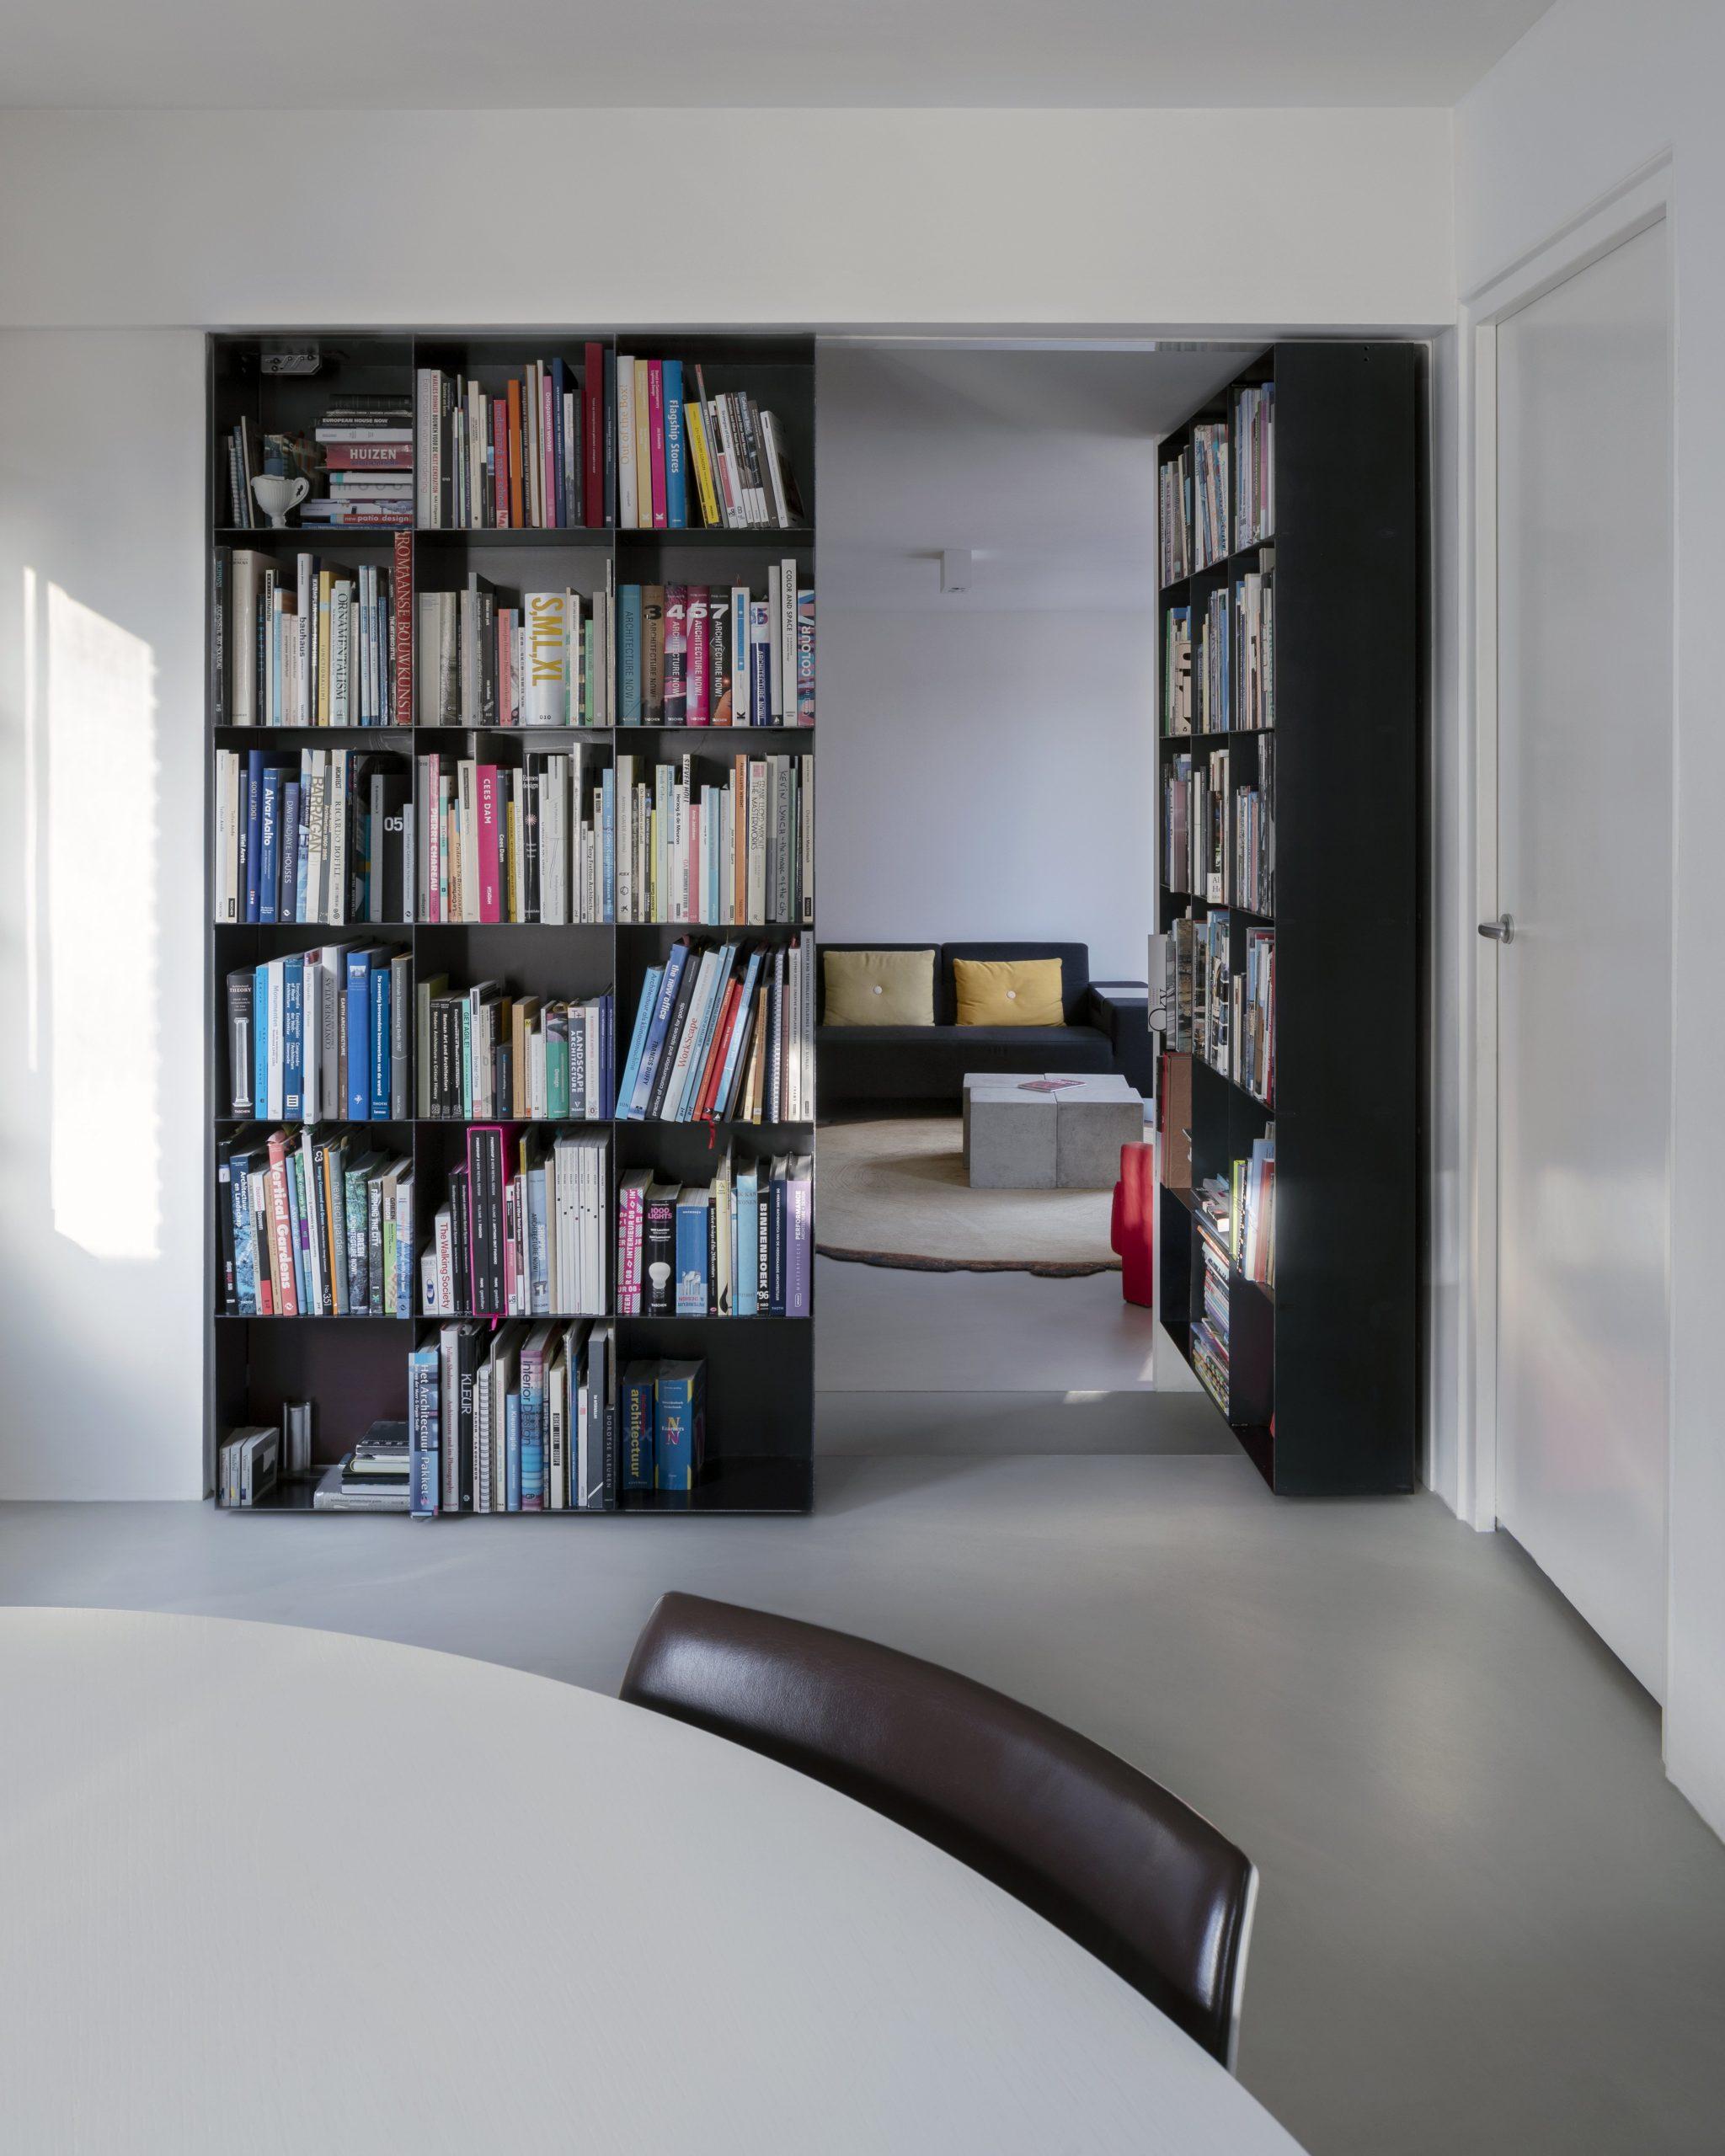 secret-bookcase-with-fritsjurgens-pivot-hinge-system-right-door-opened-scaled.jpg